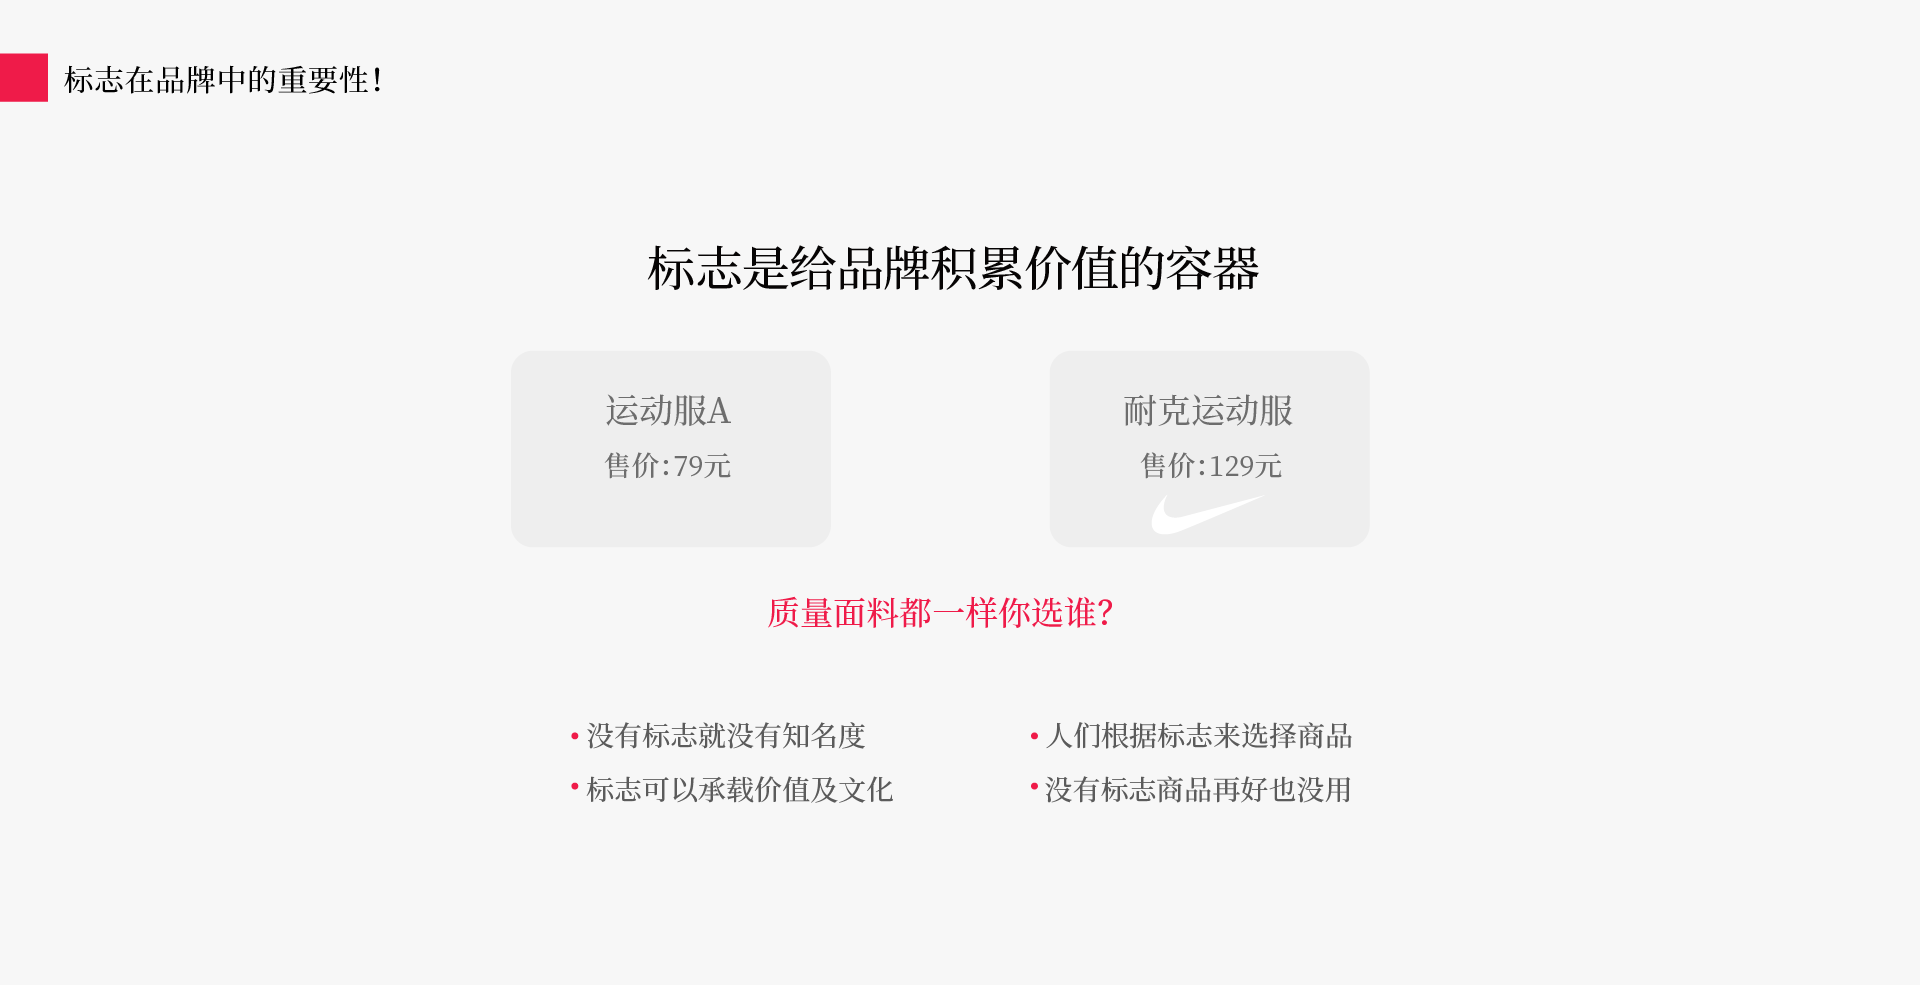 张韬品牌设计ppt-07.png